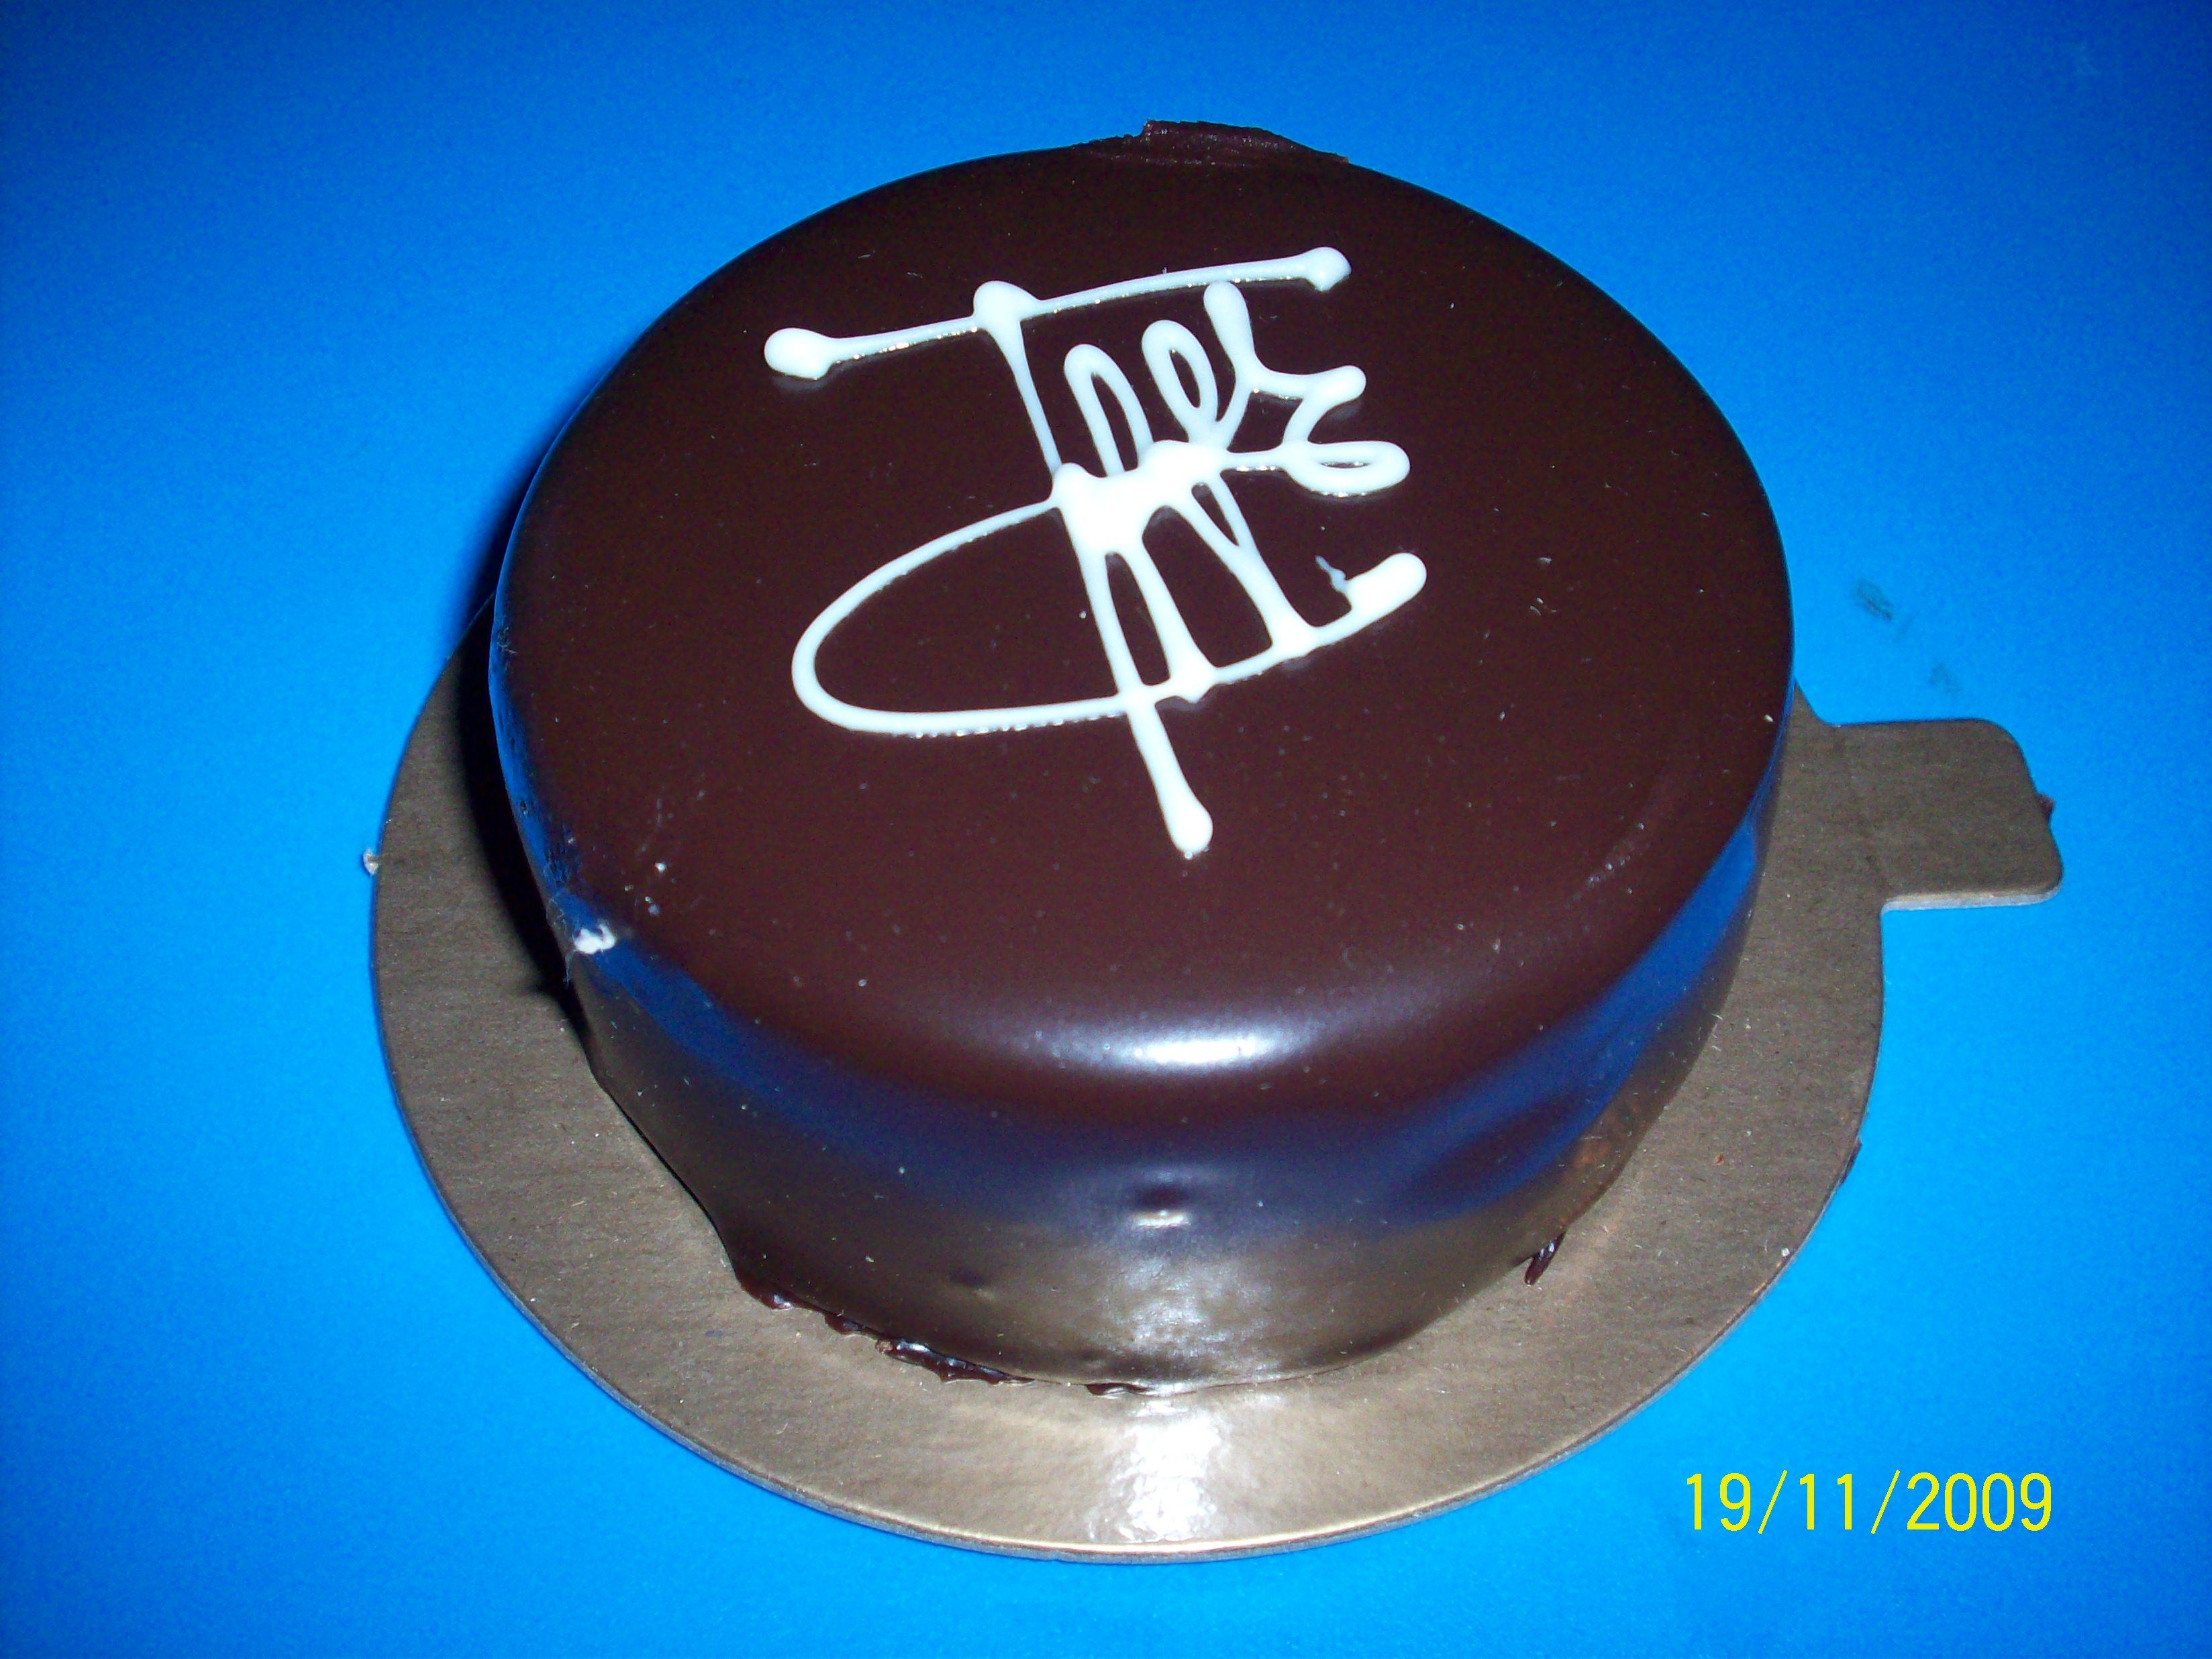 http://foodloader.net/cutie_2009-11-19_Truffe_au_Chocolat.jpg